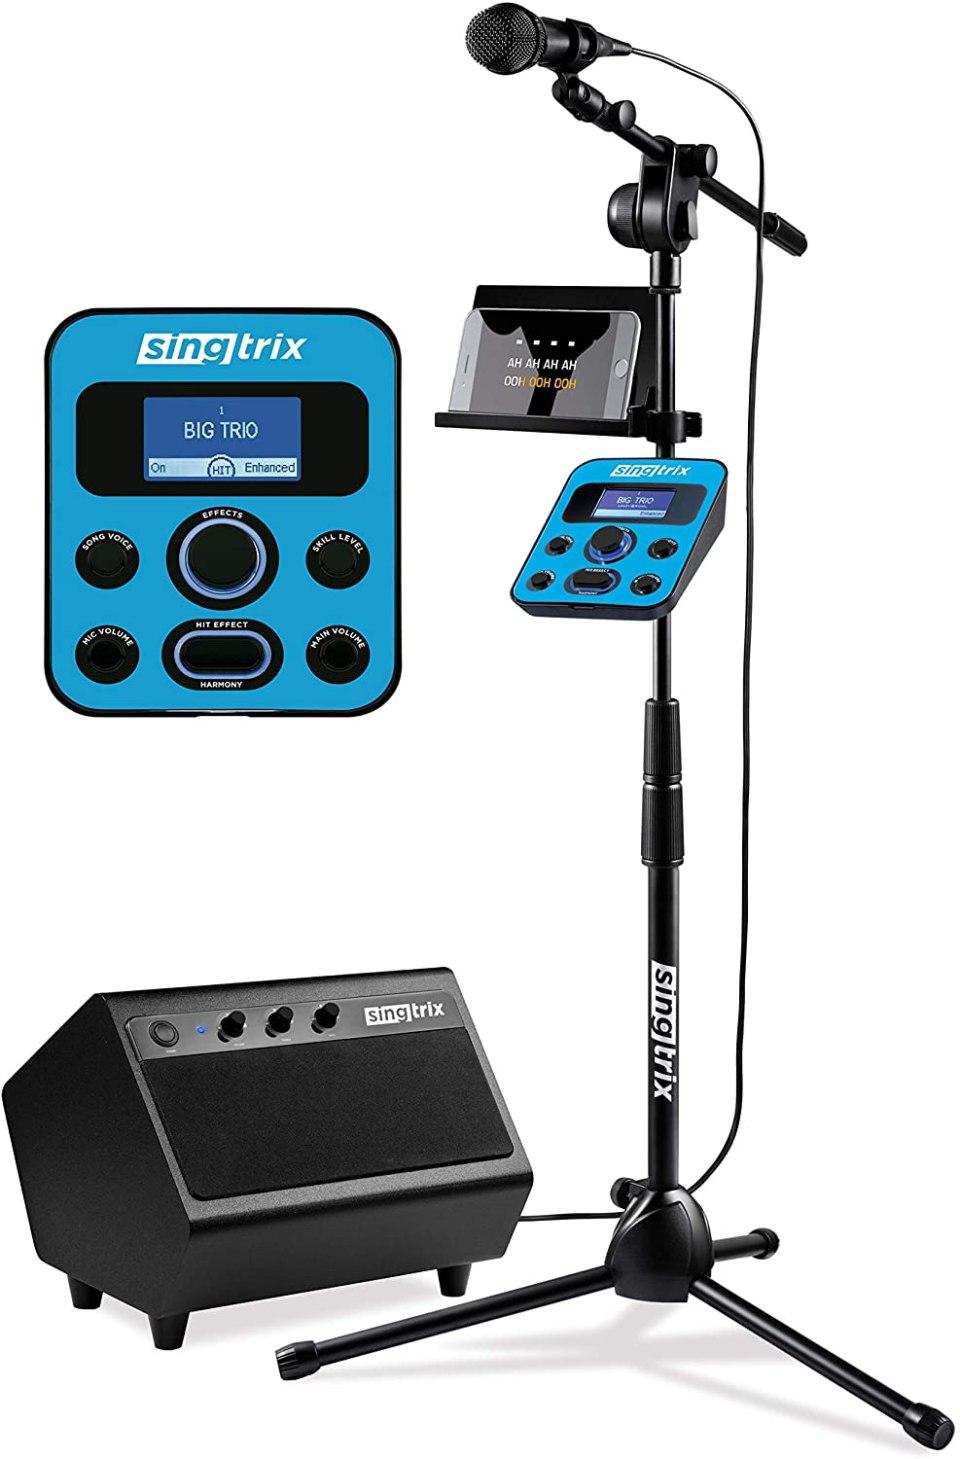 Singtrix SGTX2 Party Bundle Stadium Edition Home Karaoke System Singapore